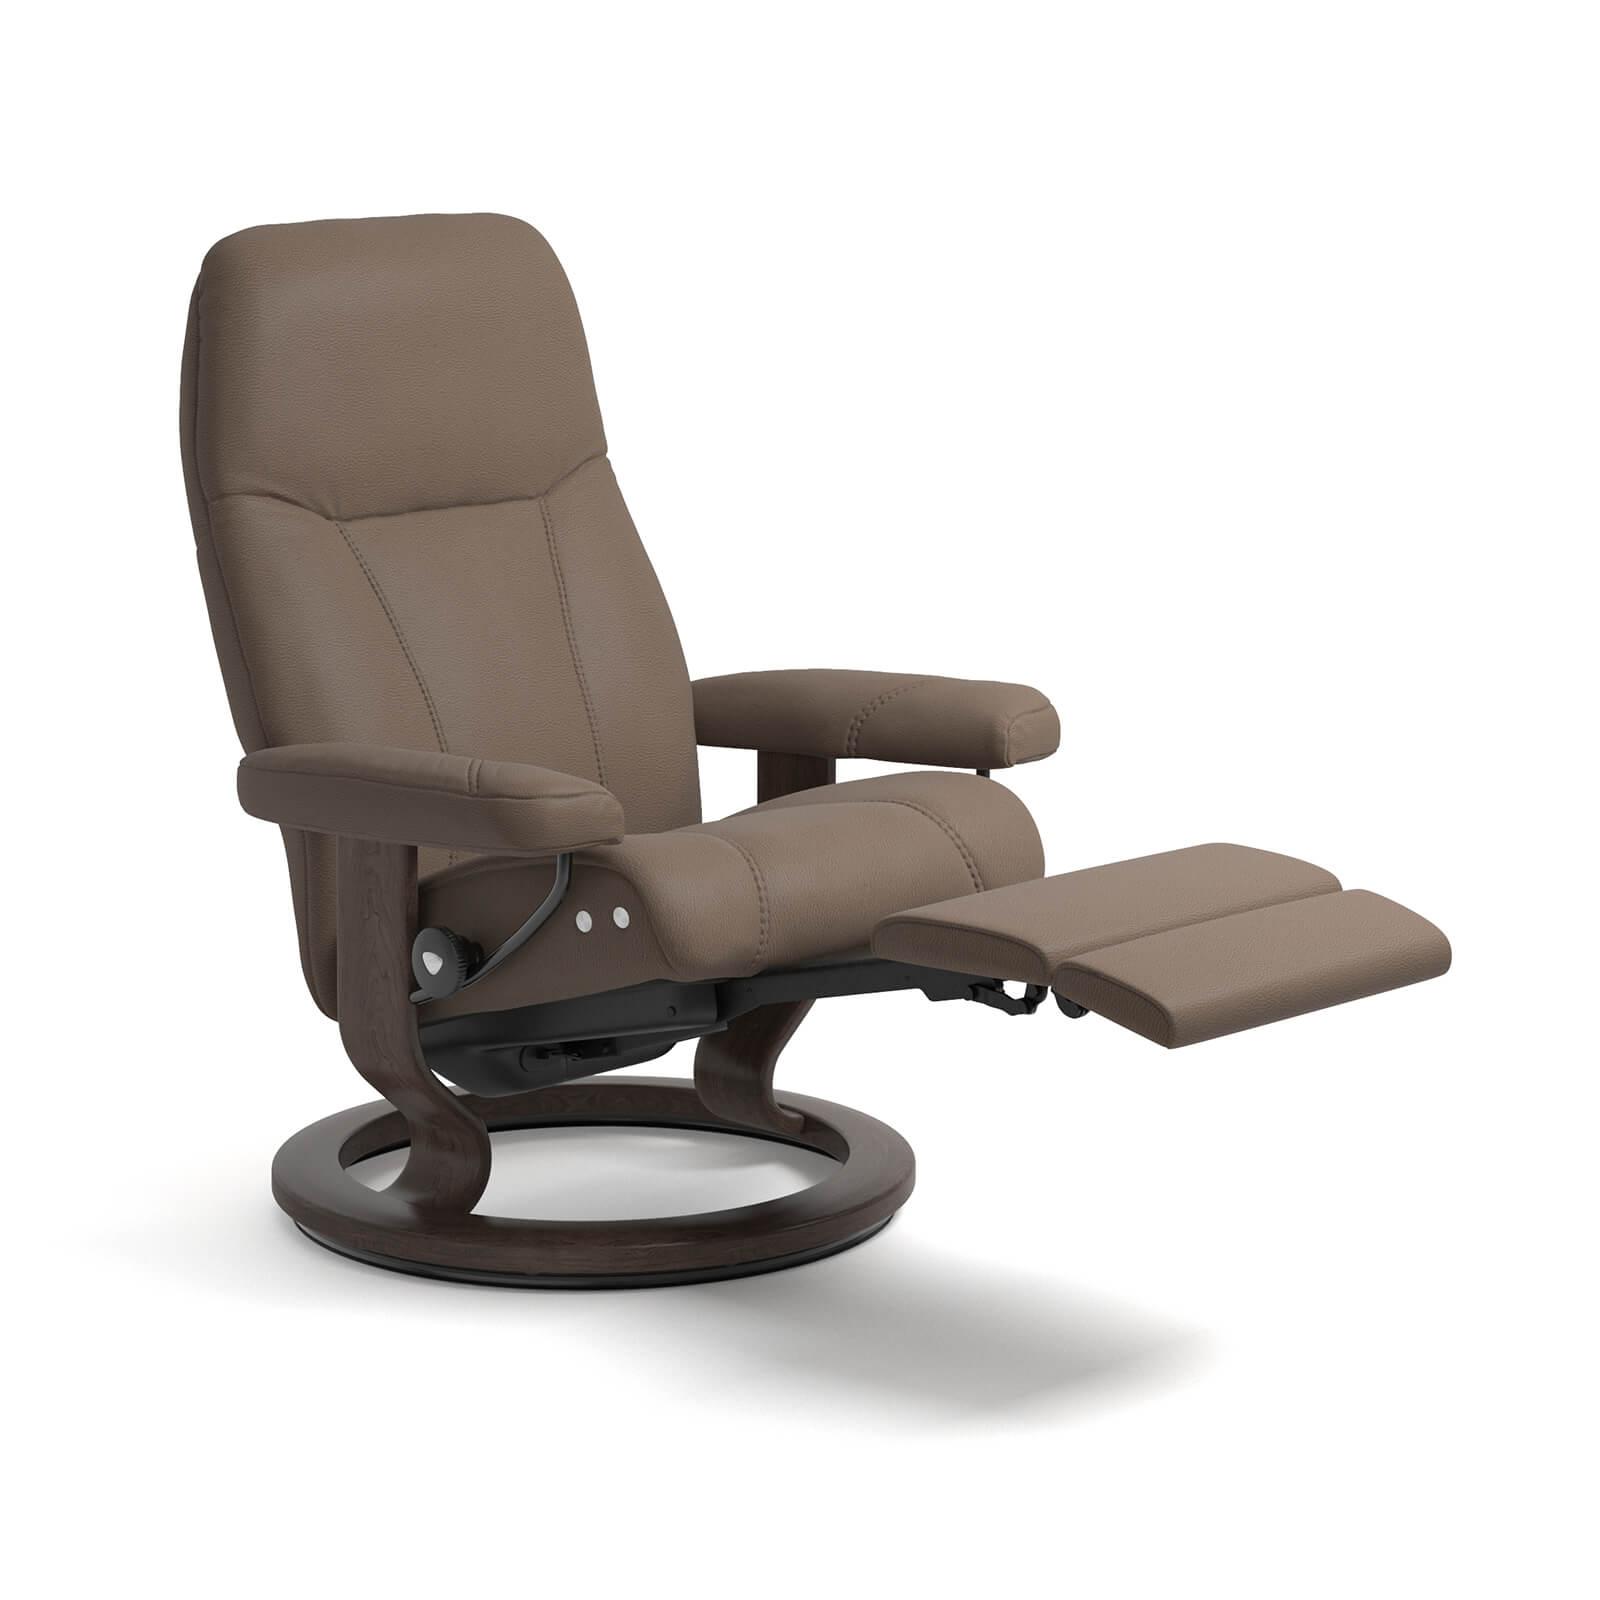 stressless reaxsessel consul legcomfort batick mole wenge. Black Bedroom Furniture Sets. Home Design Ideas